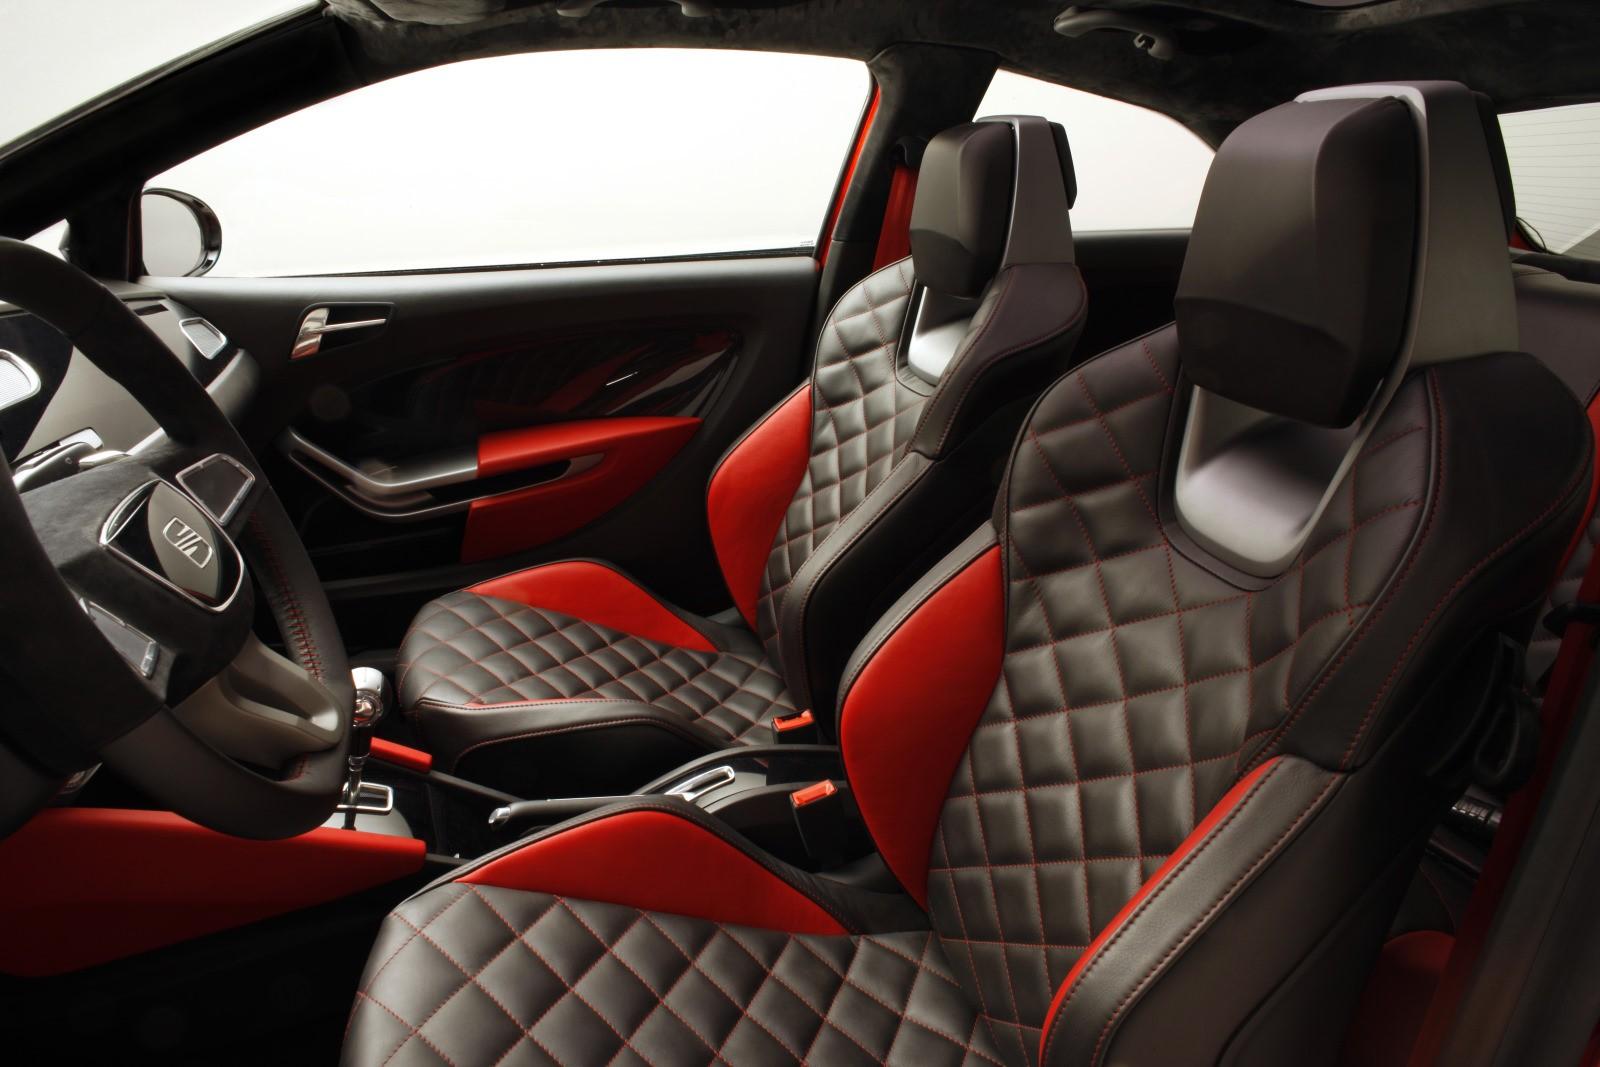 2008 seat bocanegra concepts for Interieur seat ibiza cupra